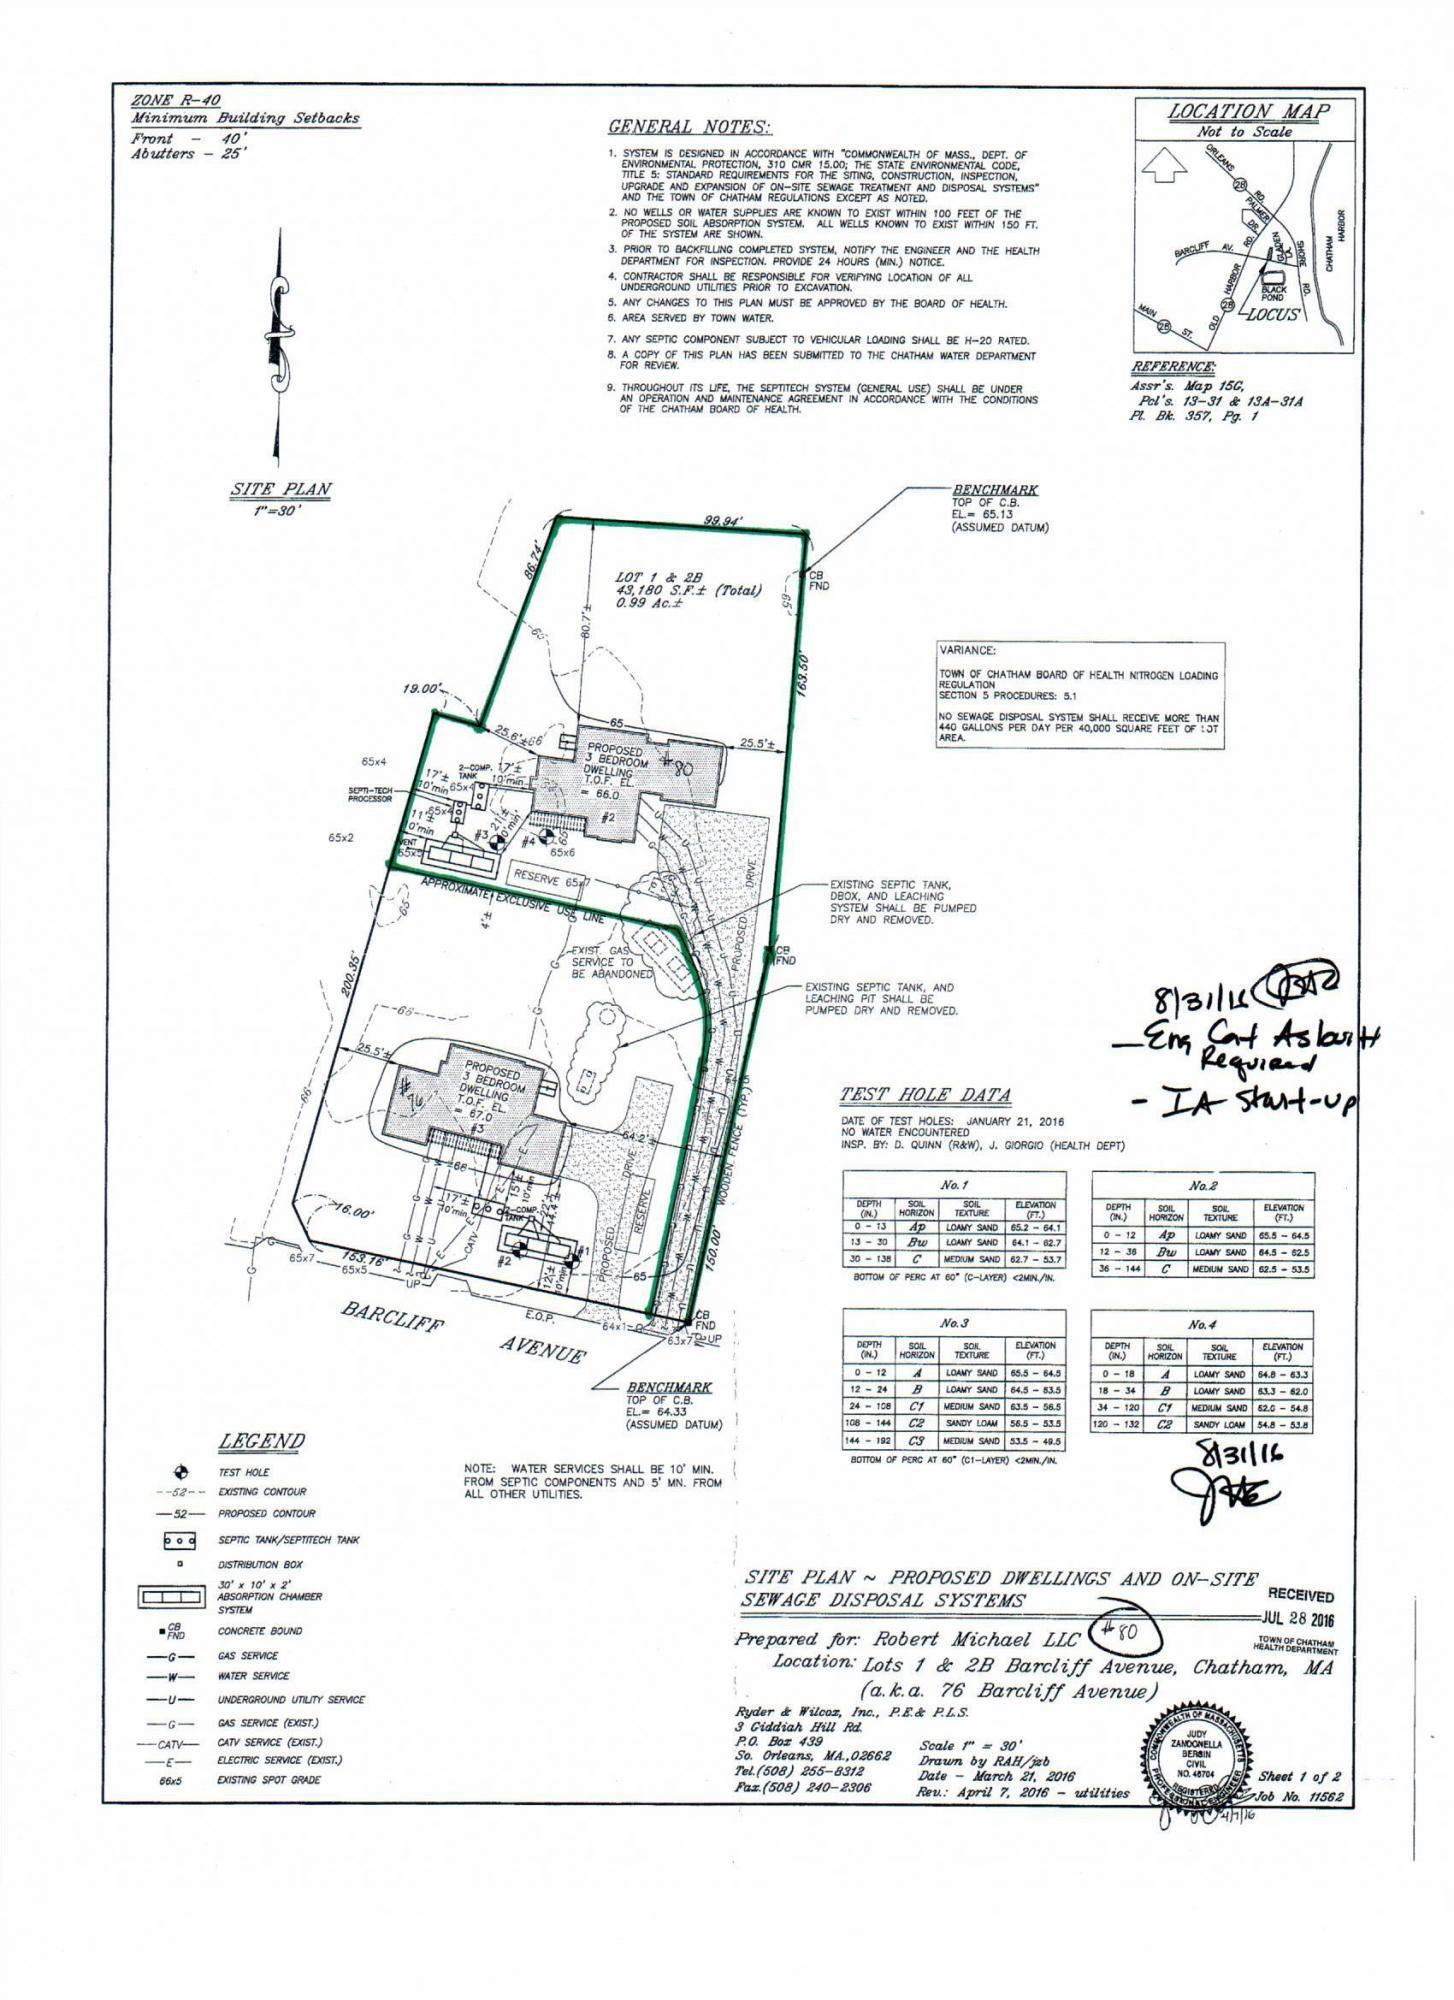 80 Barcliff Avenue, Chatham MA, 02633 - slide 31